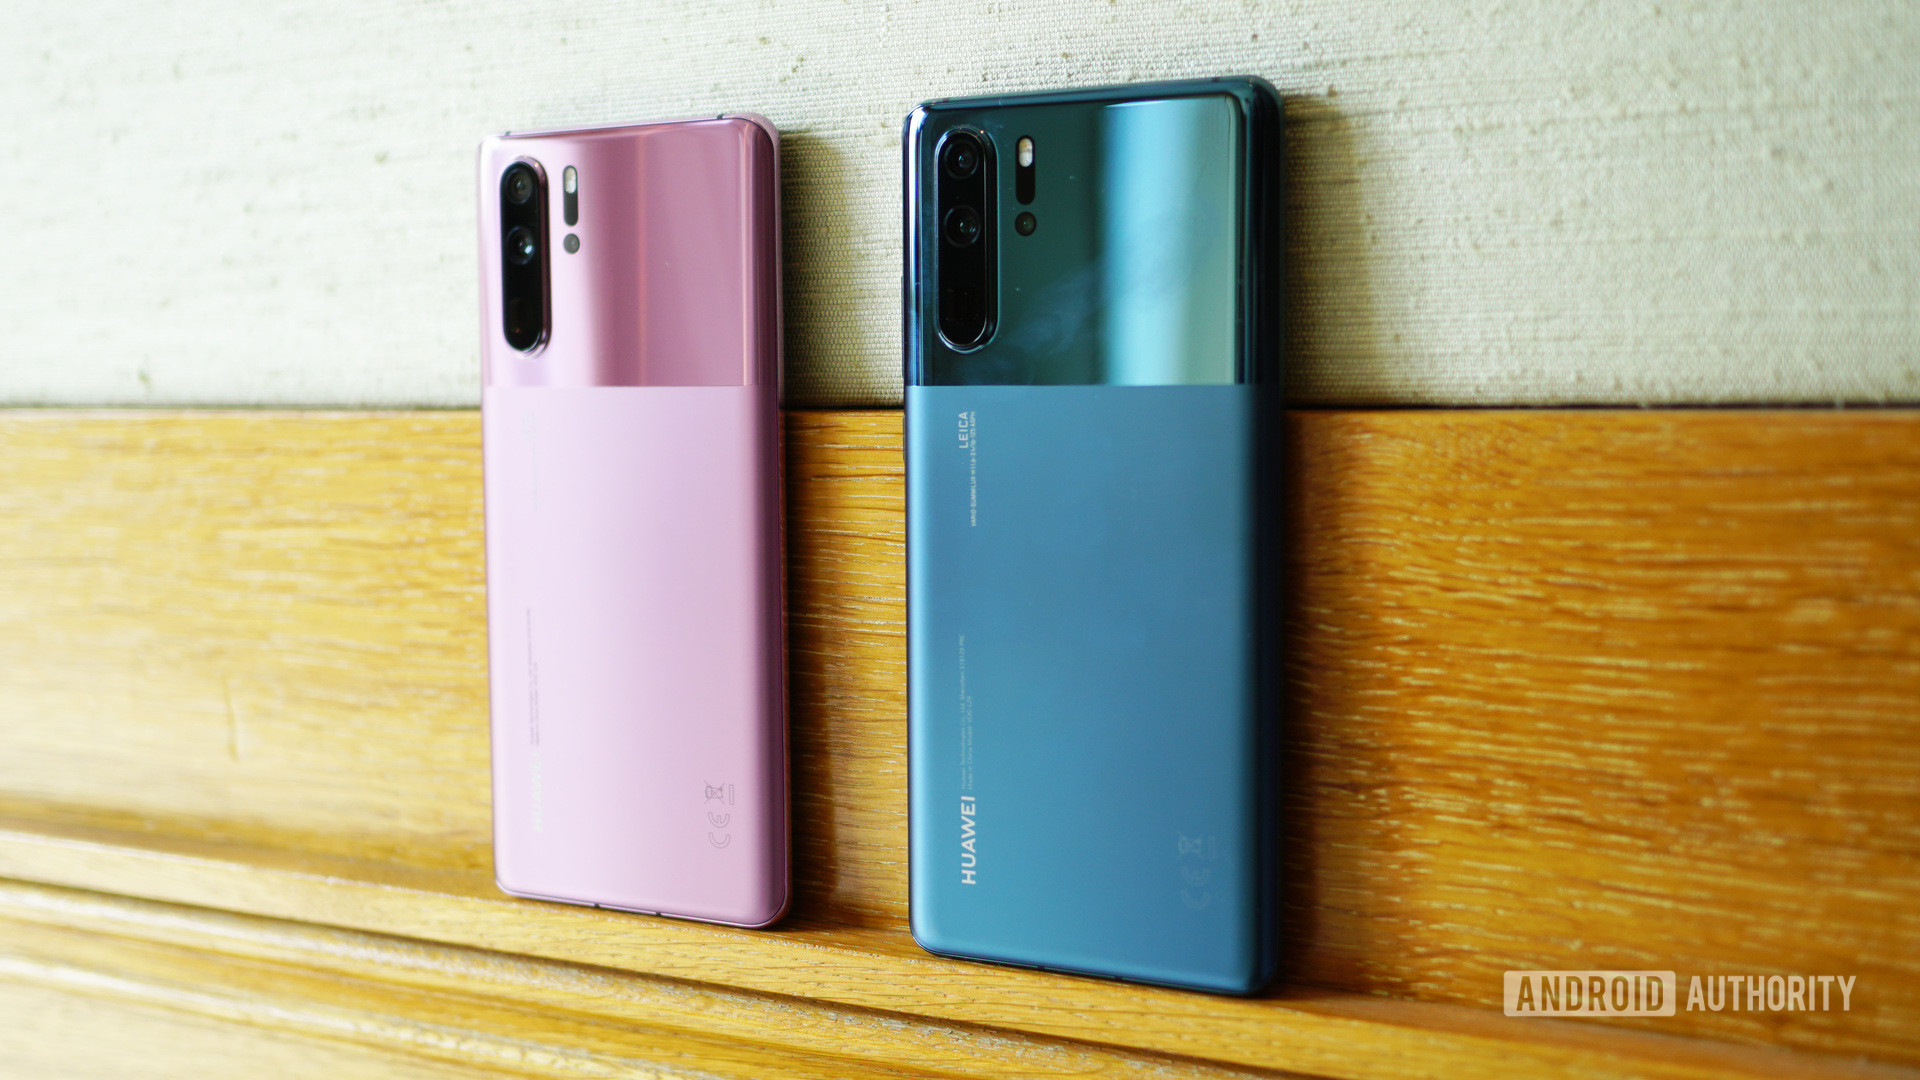 Huawei P30 Pro in misty blue misty lavender side angle